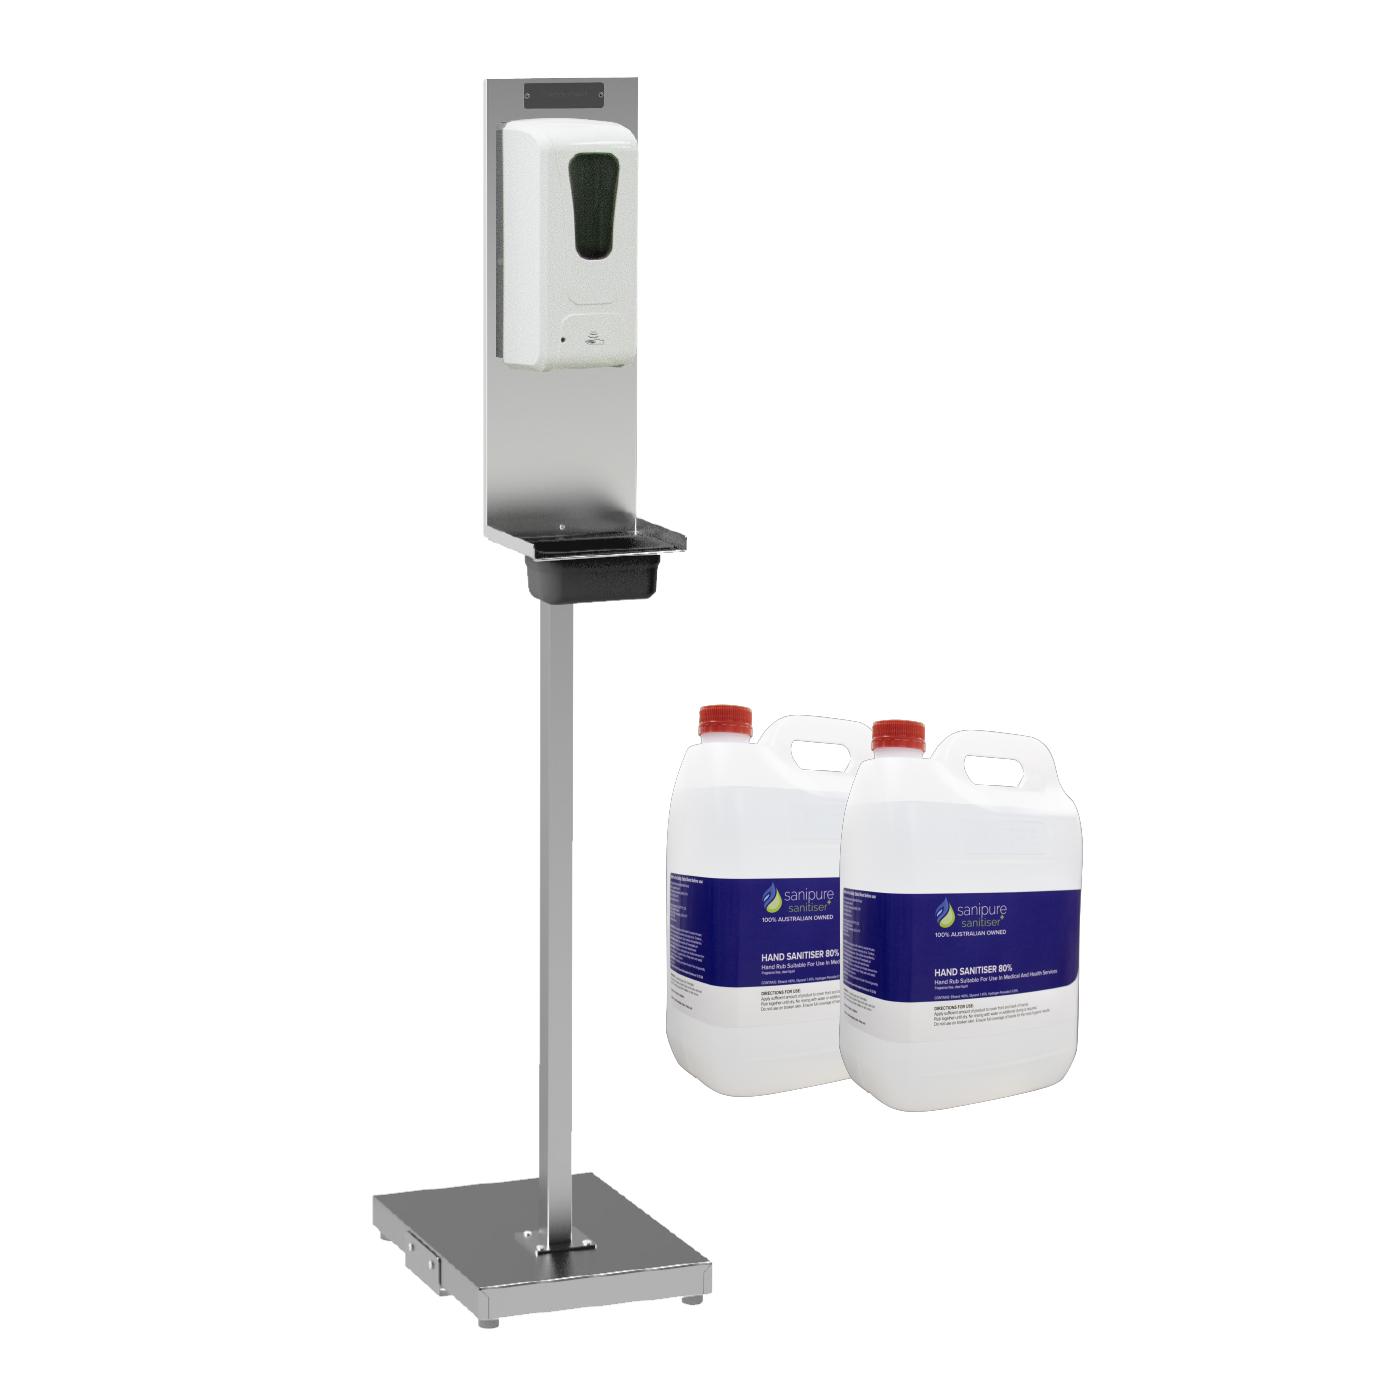 Value Pack - Stainless Steel Stand, Dispenser and Hand Sanitiser